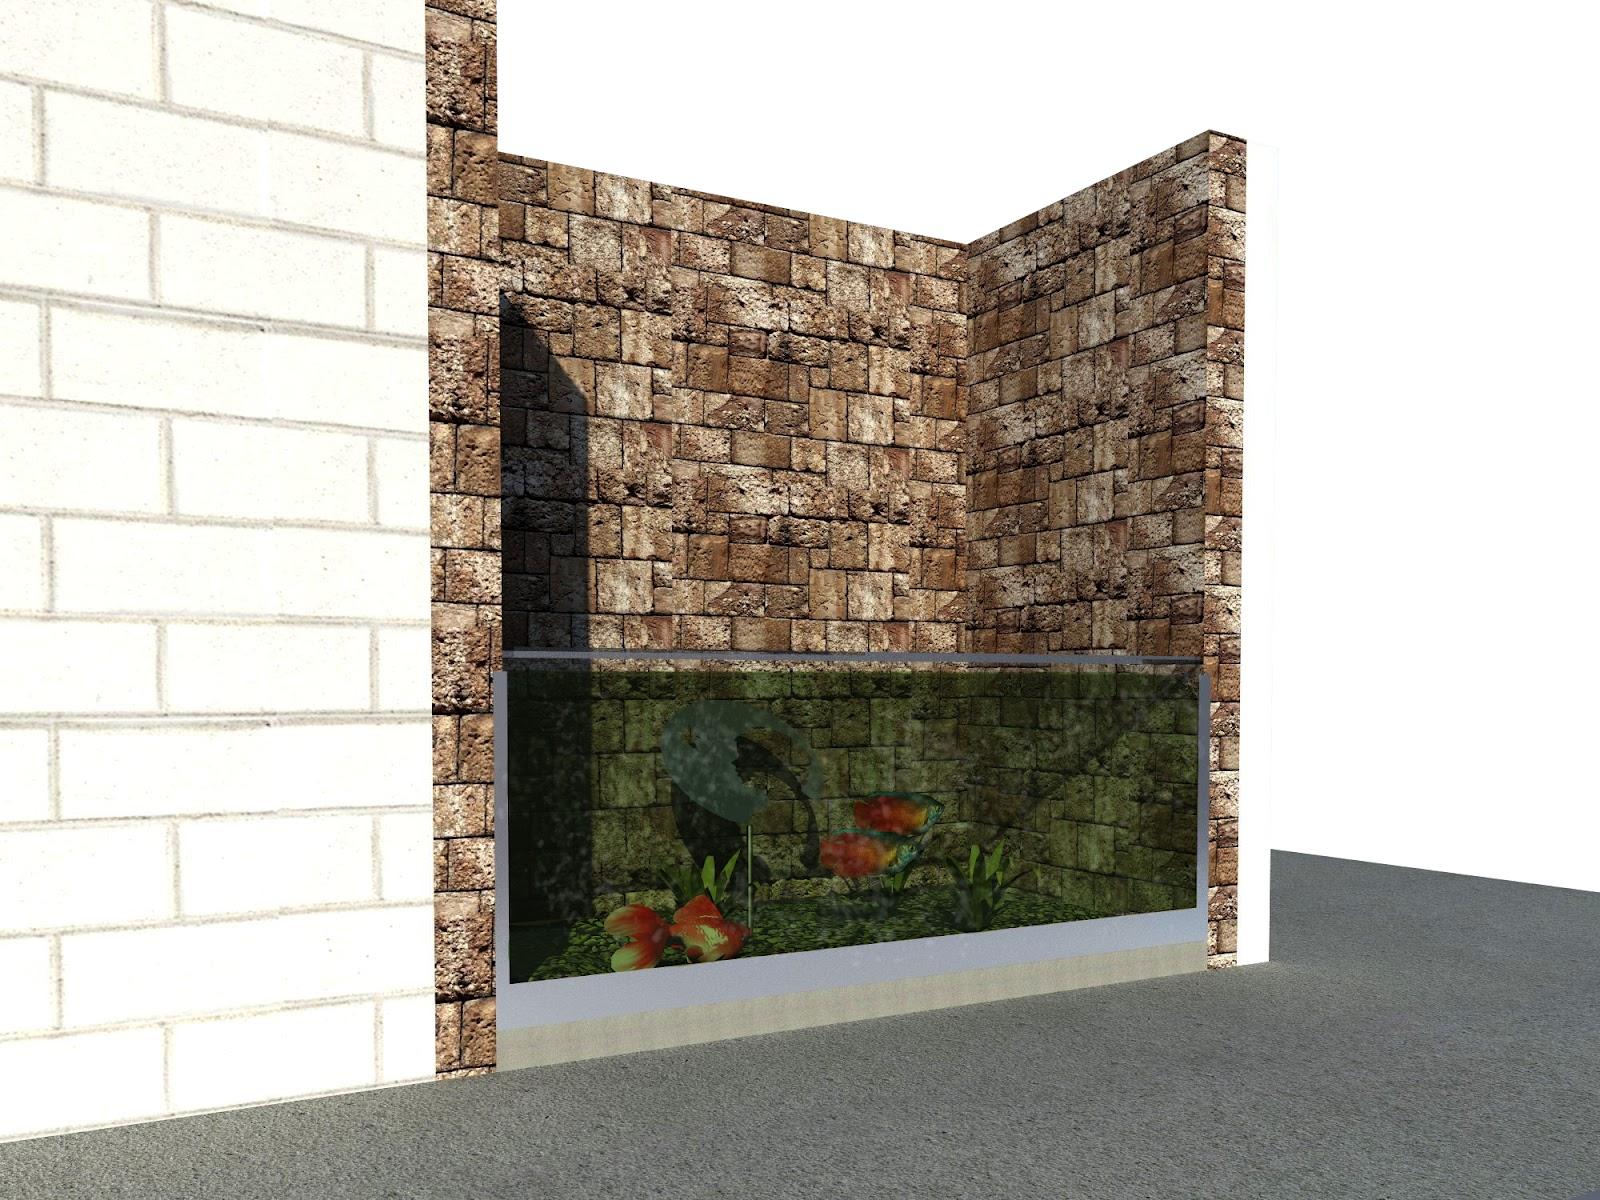 Bindack arquitectura digital render exterior acuario - Fuentes de pared modernas ...